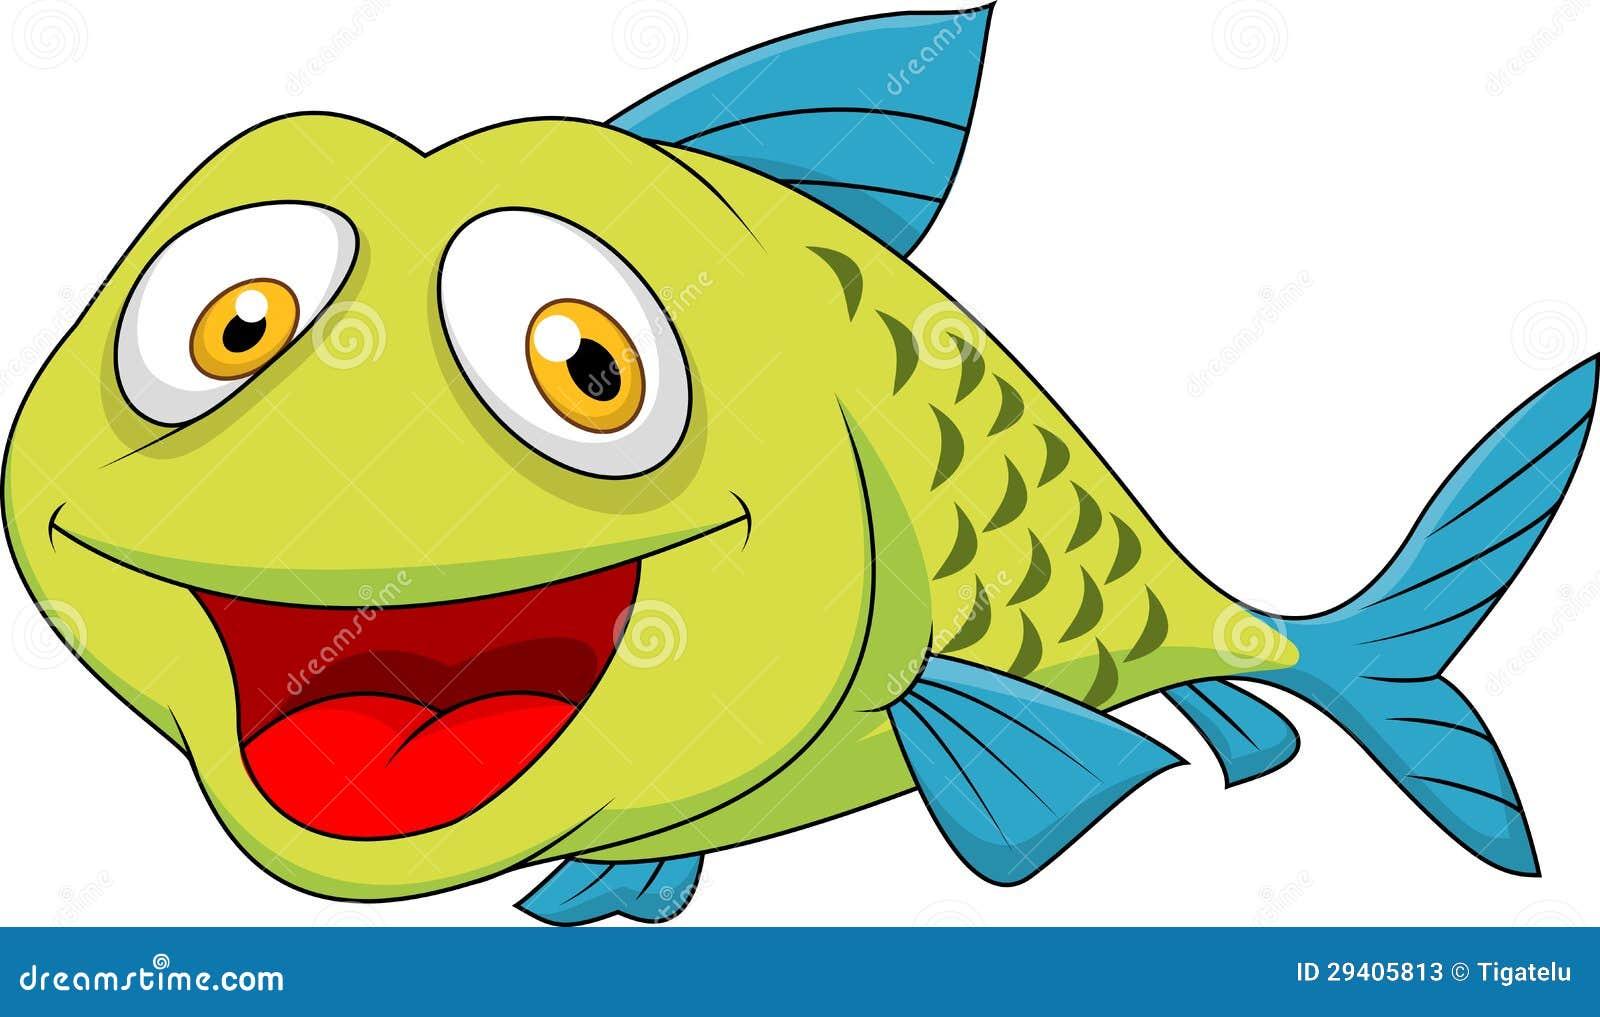 Cute fish cartoon stock photos image 29405813